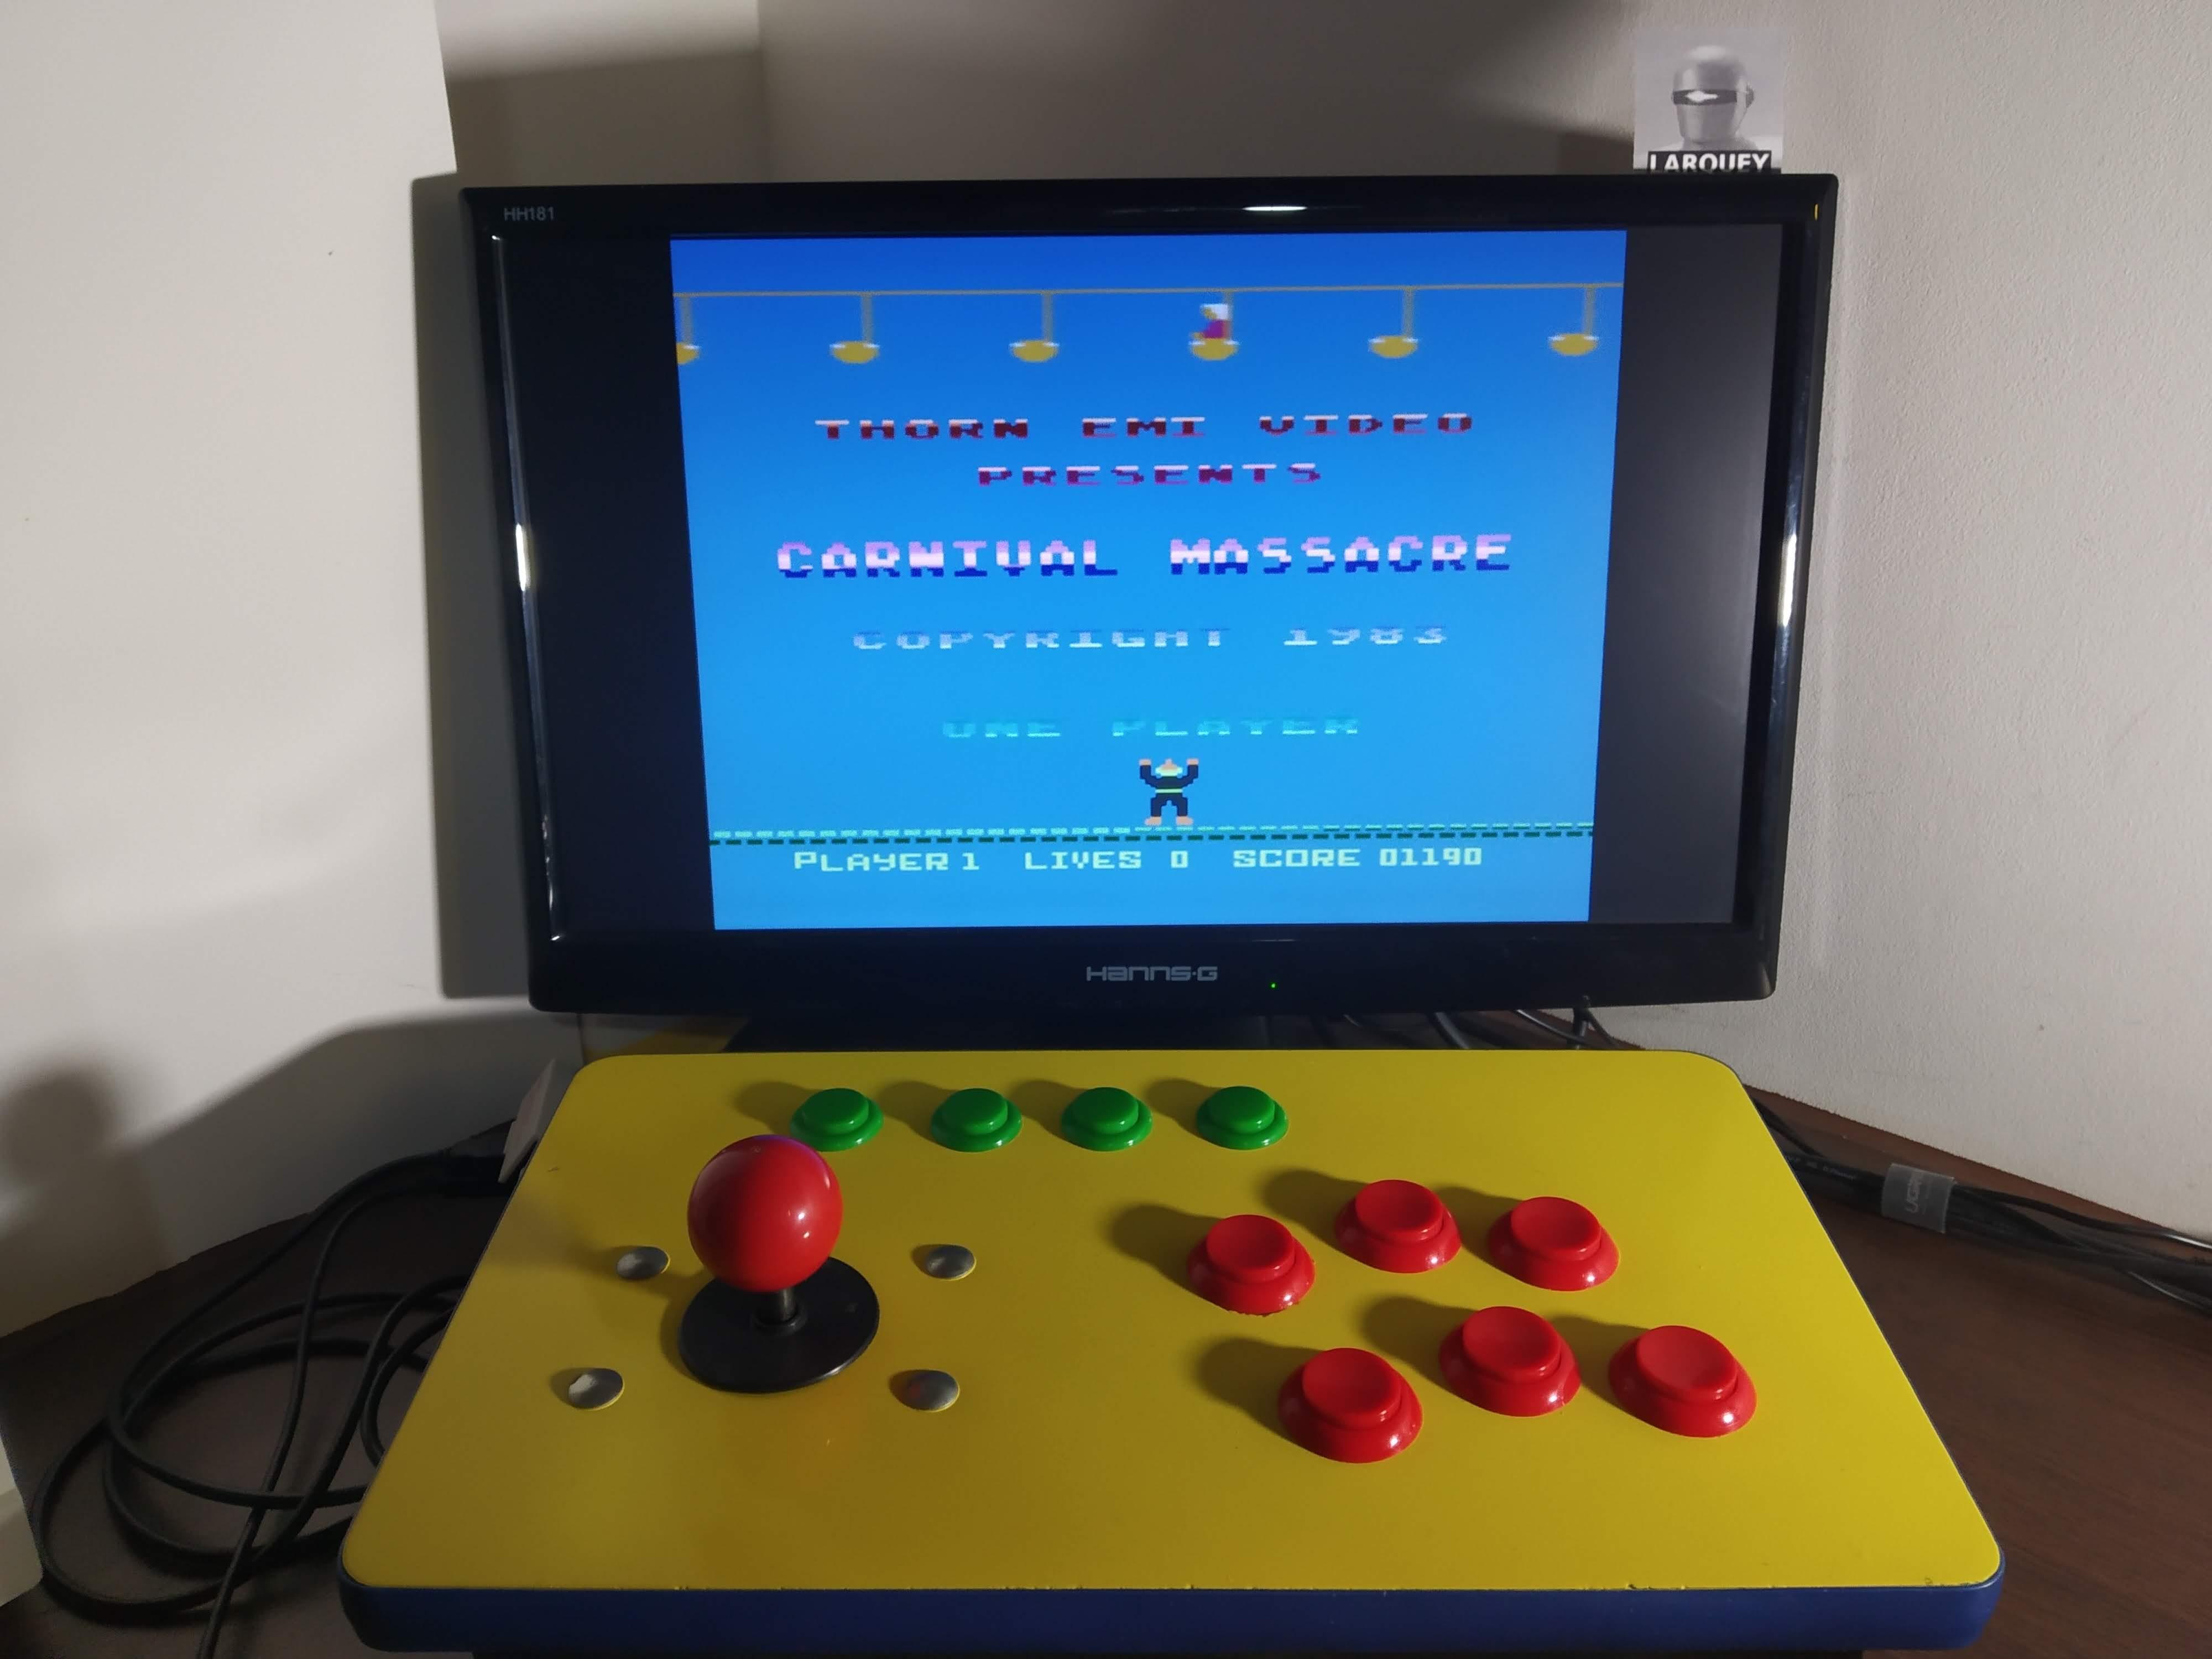 Larquey: Carnival Massacre (Atari 400/800/XL/XE Emulated) 1,190 points on 2020-01-02 08:02:16